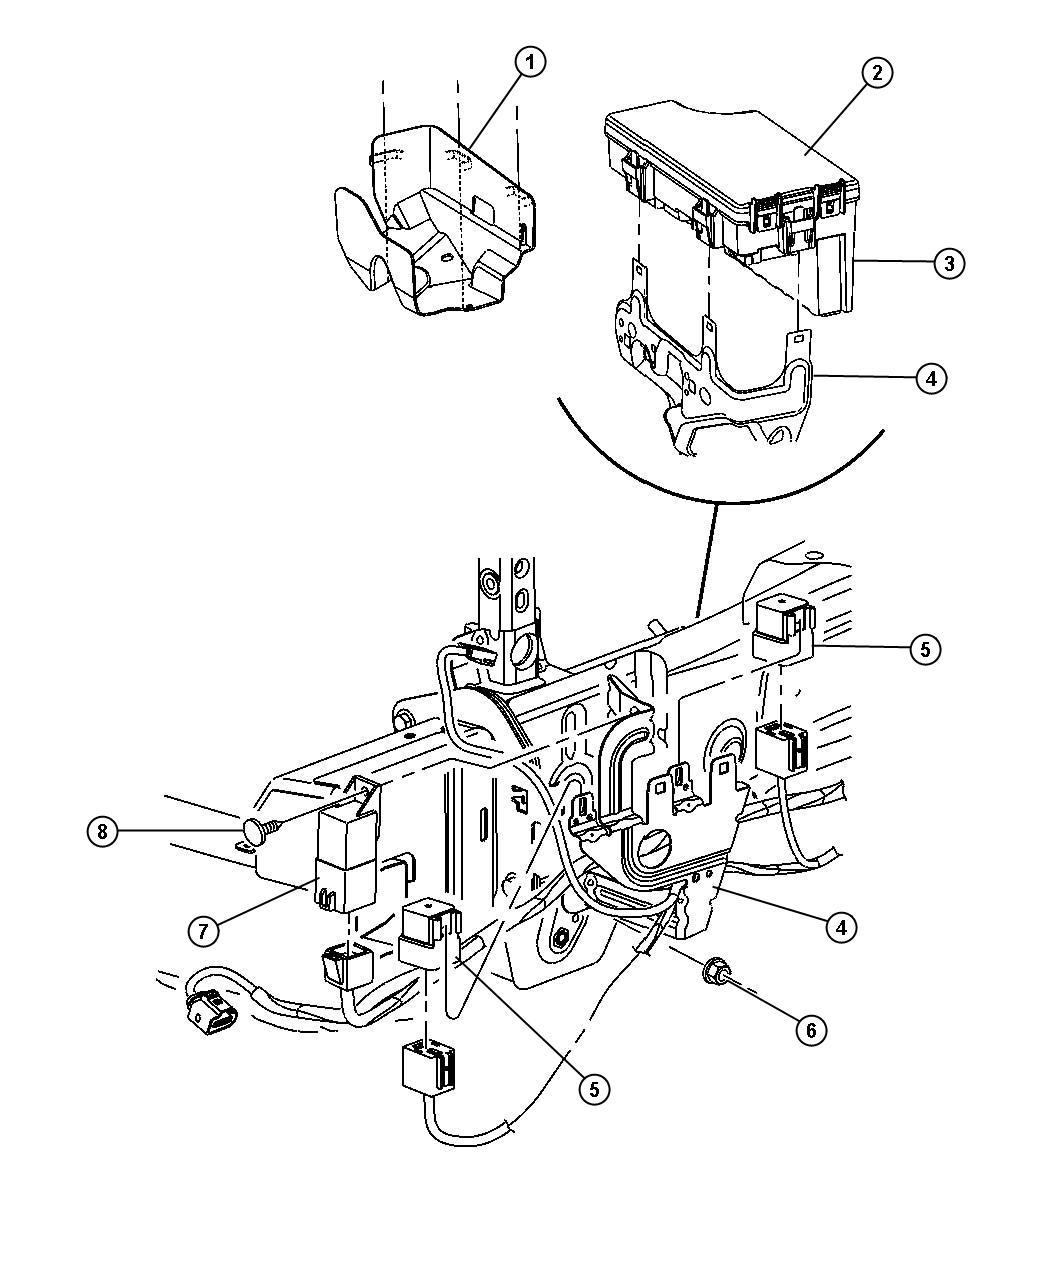 Jeep Patriot Module Glow Plug Modules Compartment